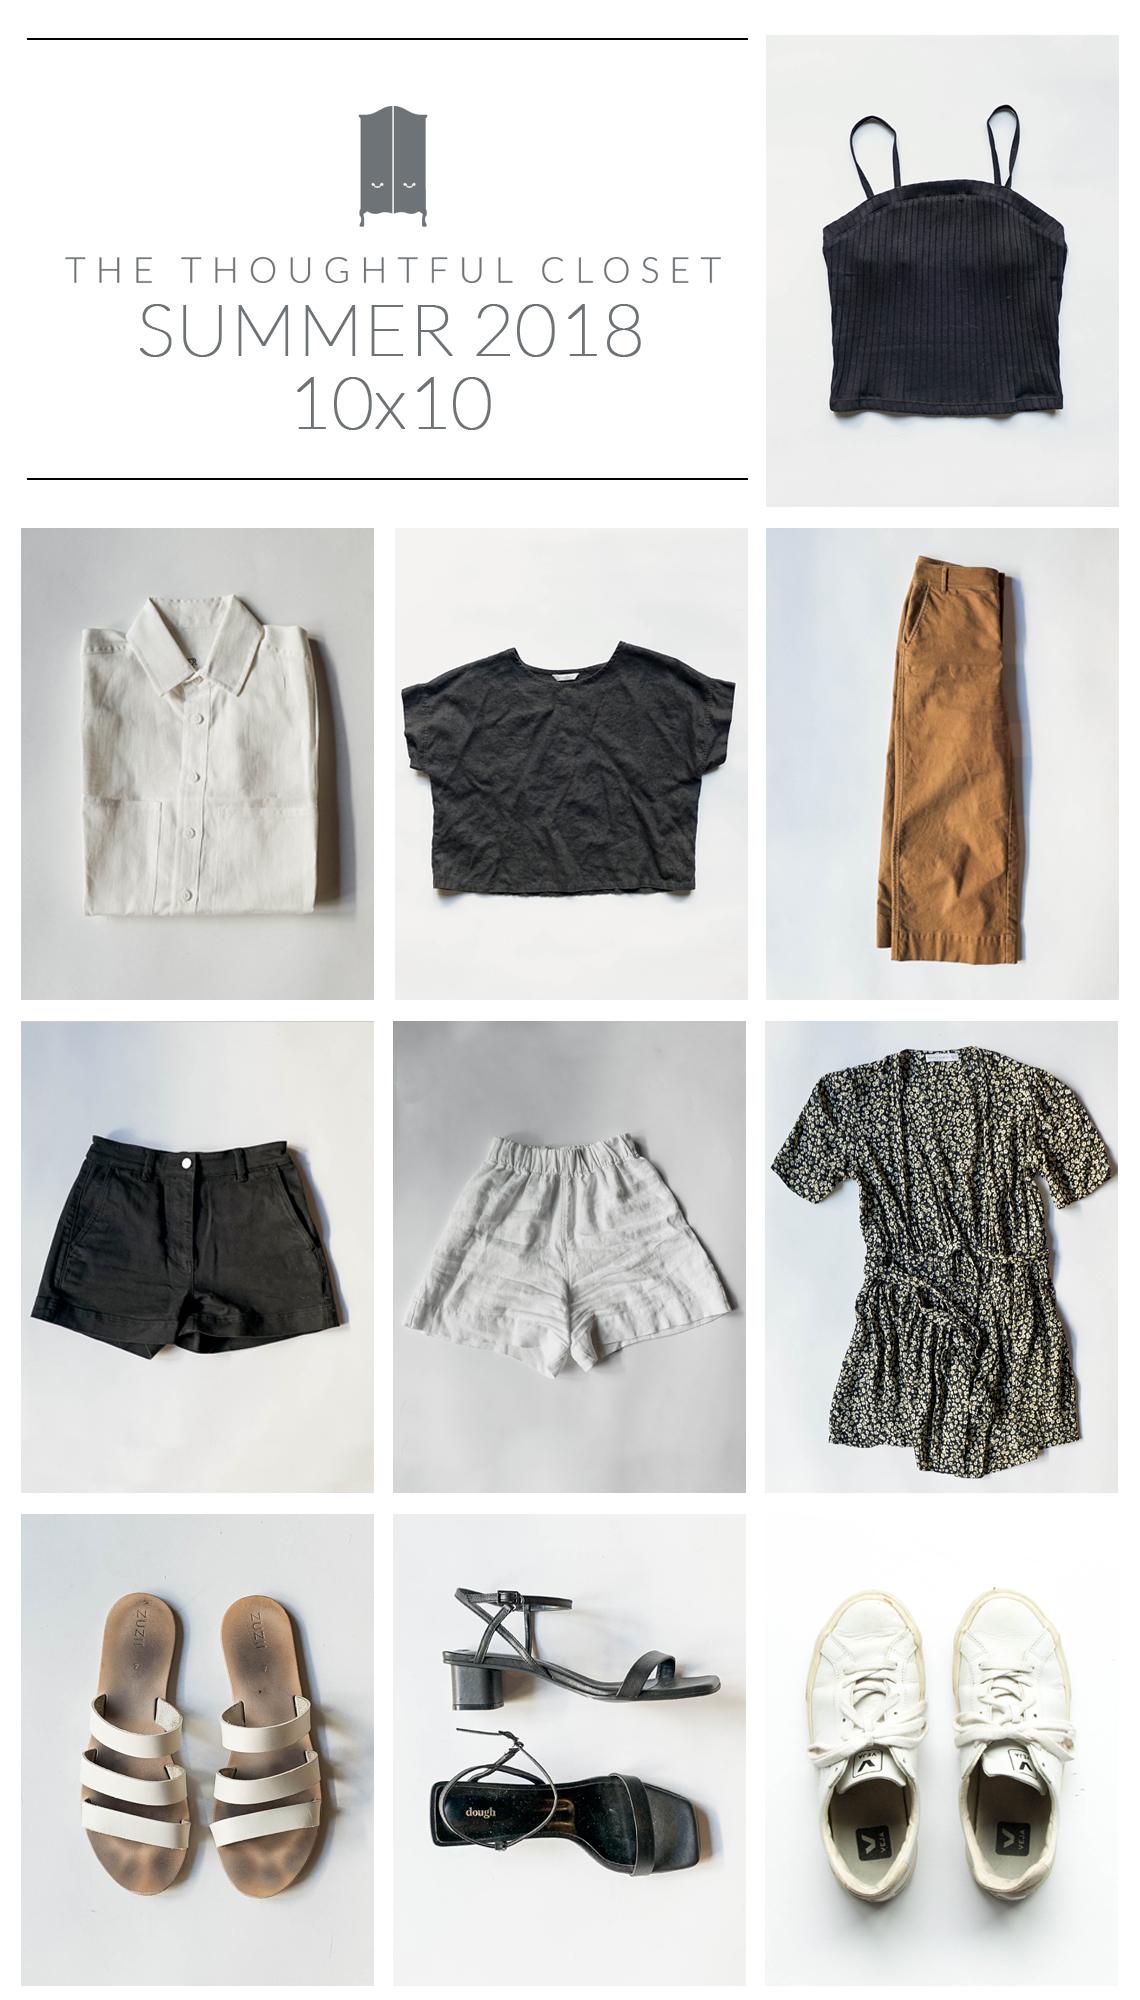 the-thoughtful-closet_summer-10x10-2018.jpg